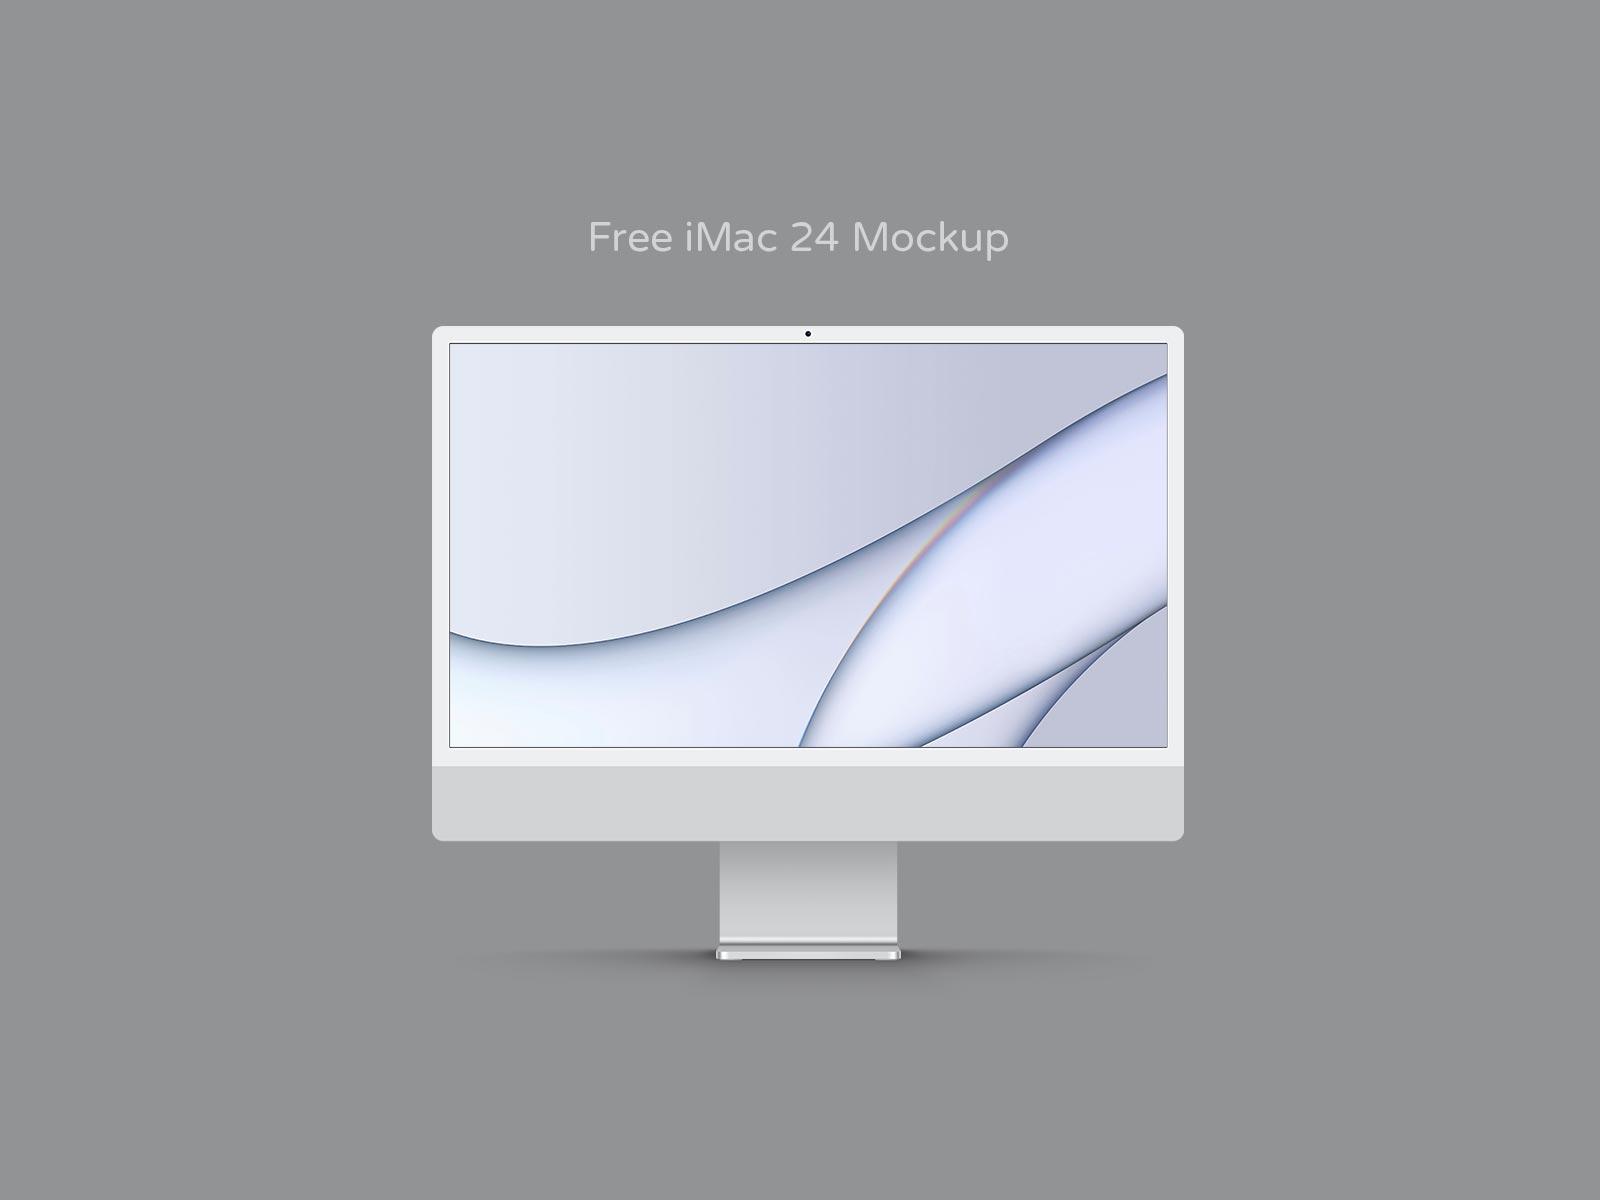 Silver-iMac-24-Mockup-PSD